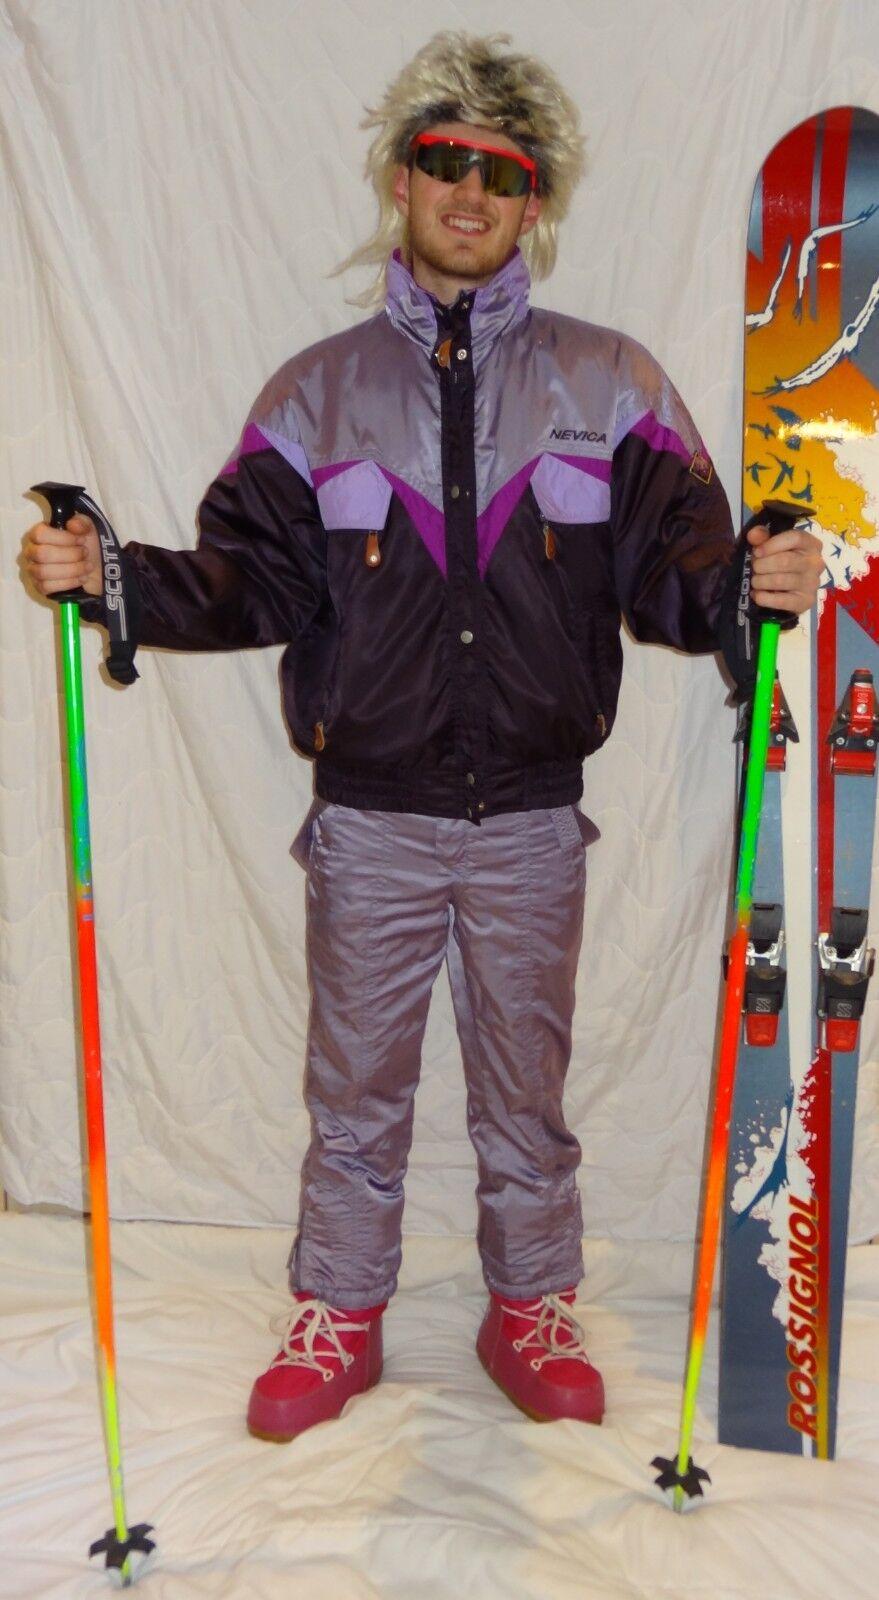 Retro Vintage 80's 90's Ski Suit STAG Neon Apres Ski NEVICA purpleC 2 PIECE SUIT